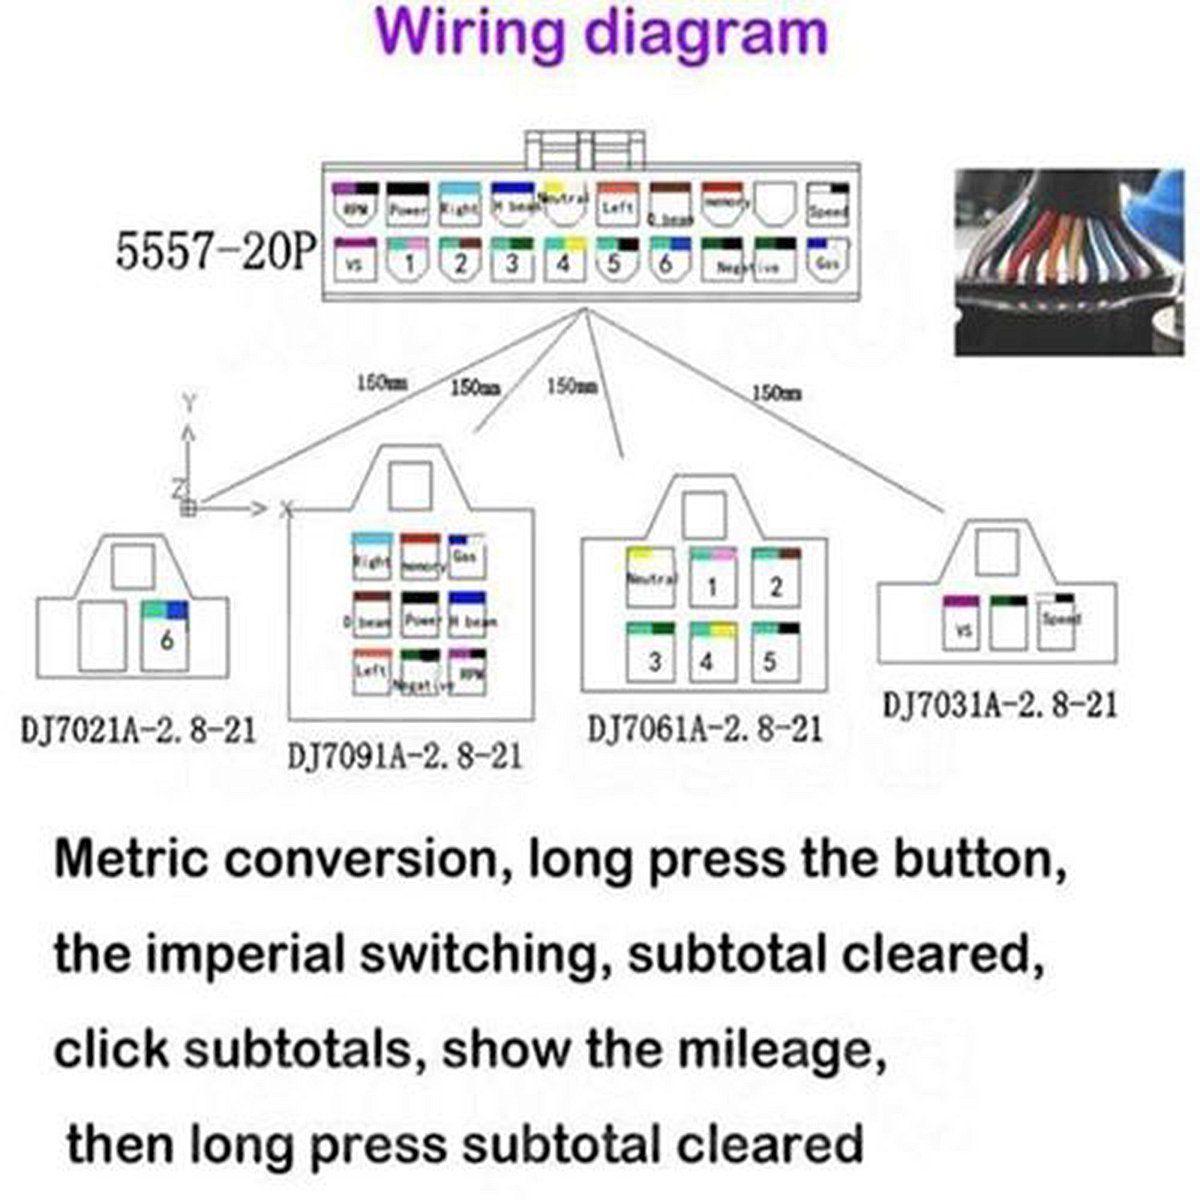 dual tachometer wiring diagram 12000 rpm kph mph lcd universal digital motorcycle speedometer  12000 rpm kph mph lcd universal digital